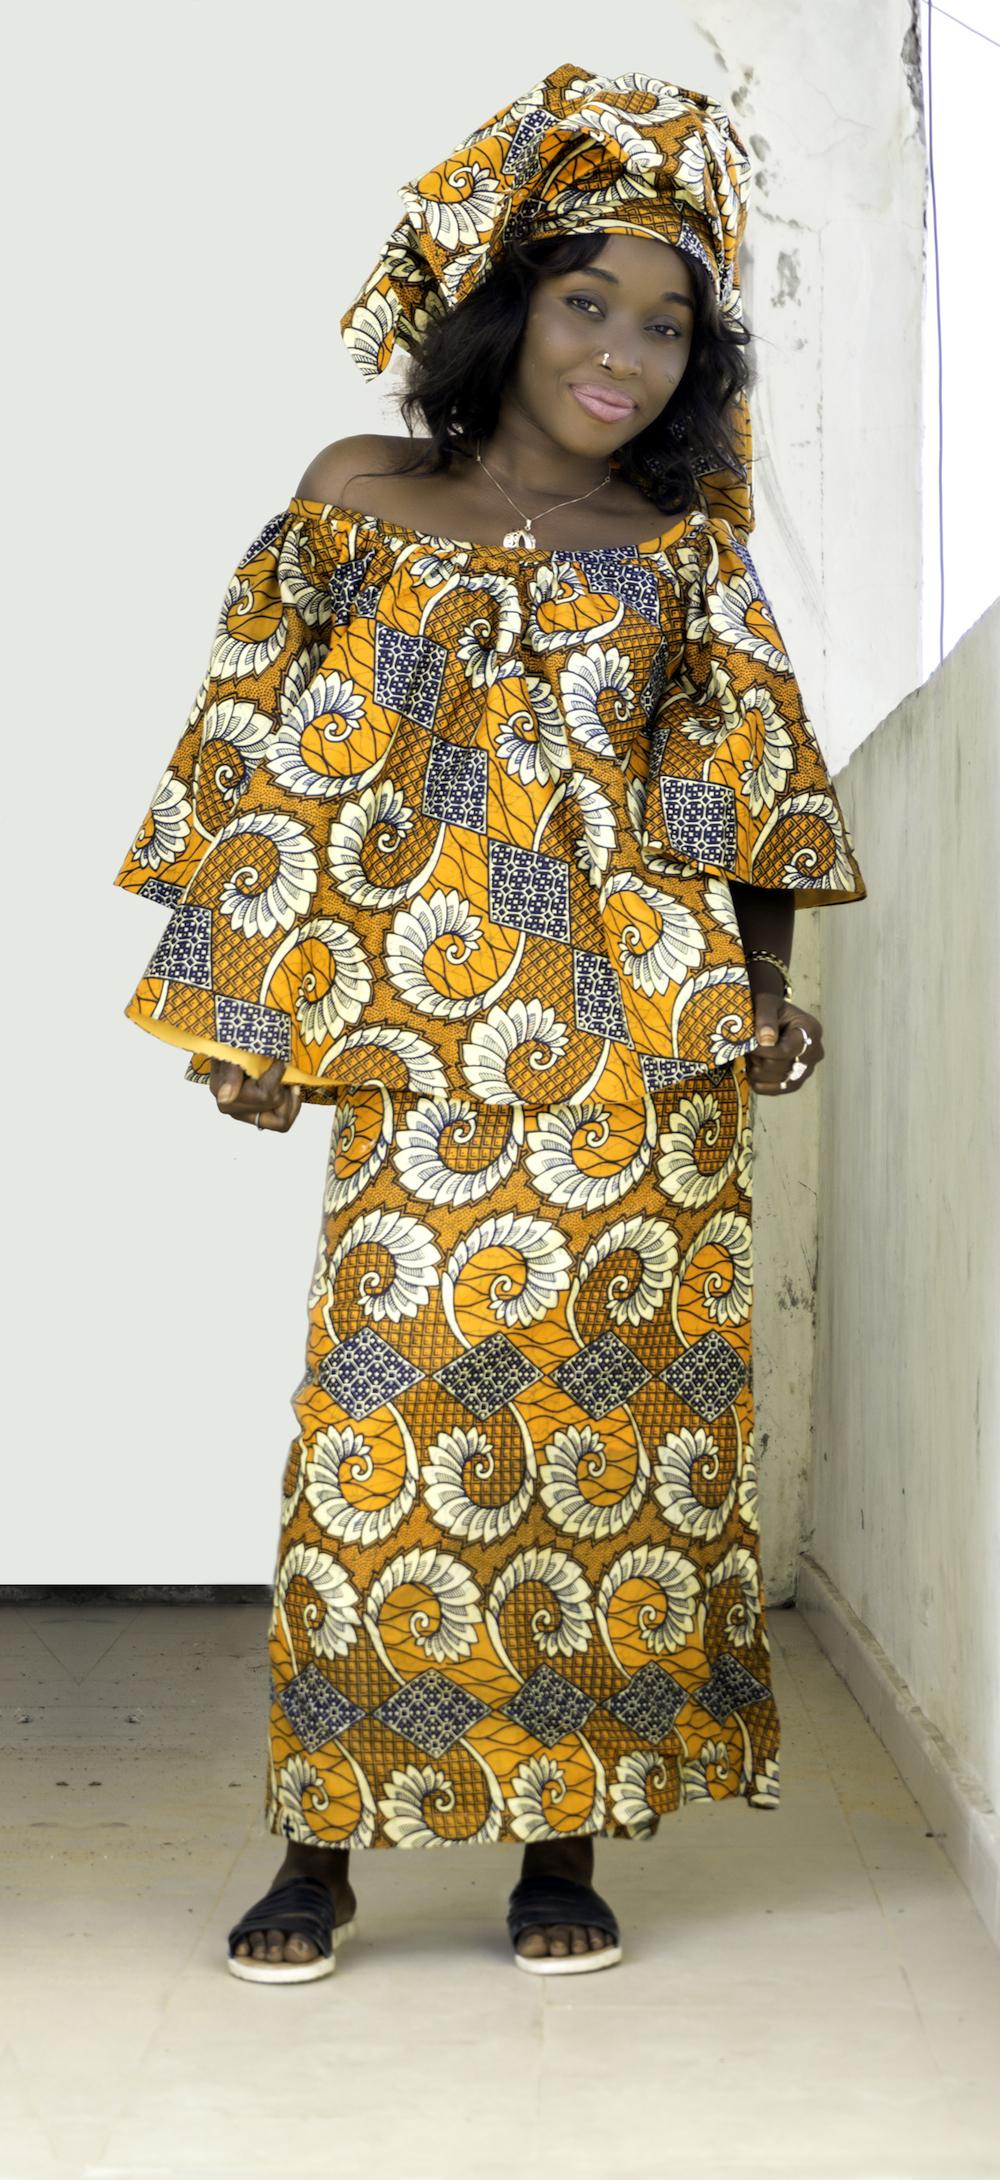 Празднование африканского текстиля в Музее искусств Мемфиса Брукса